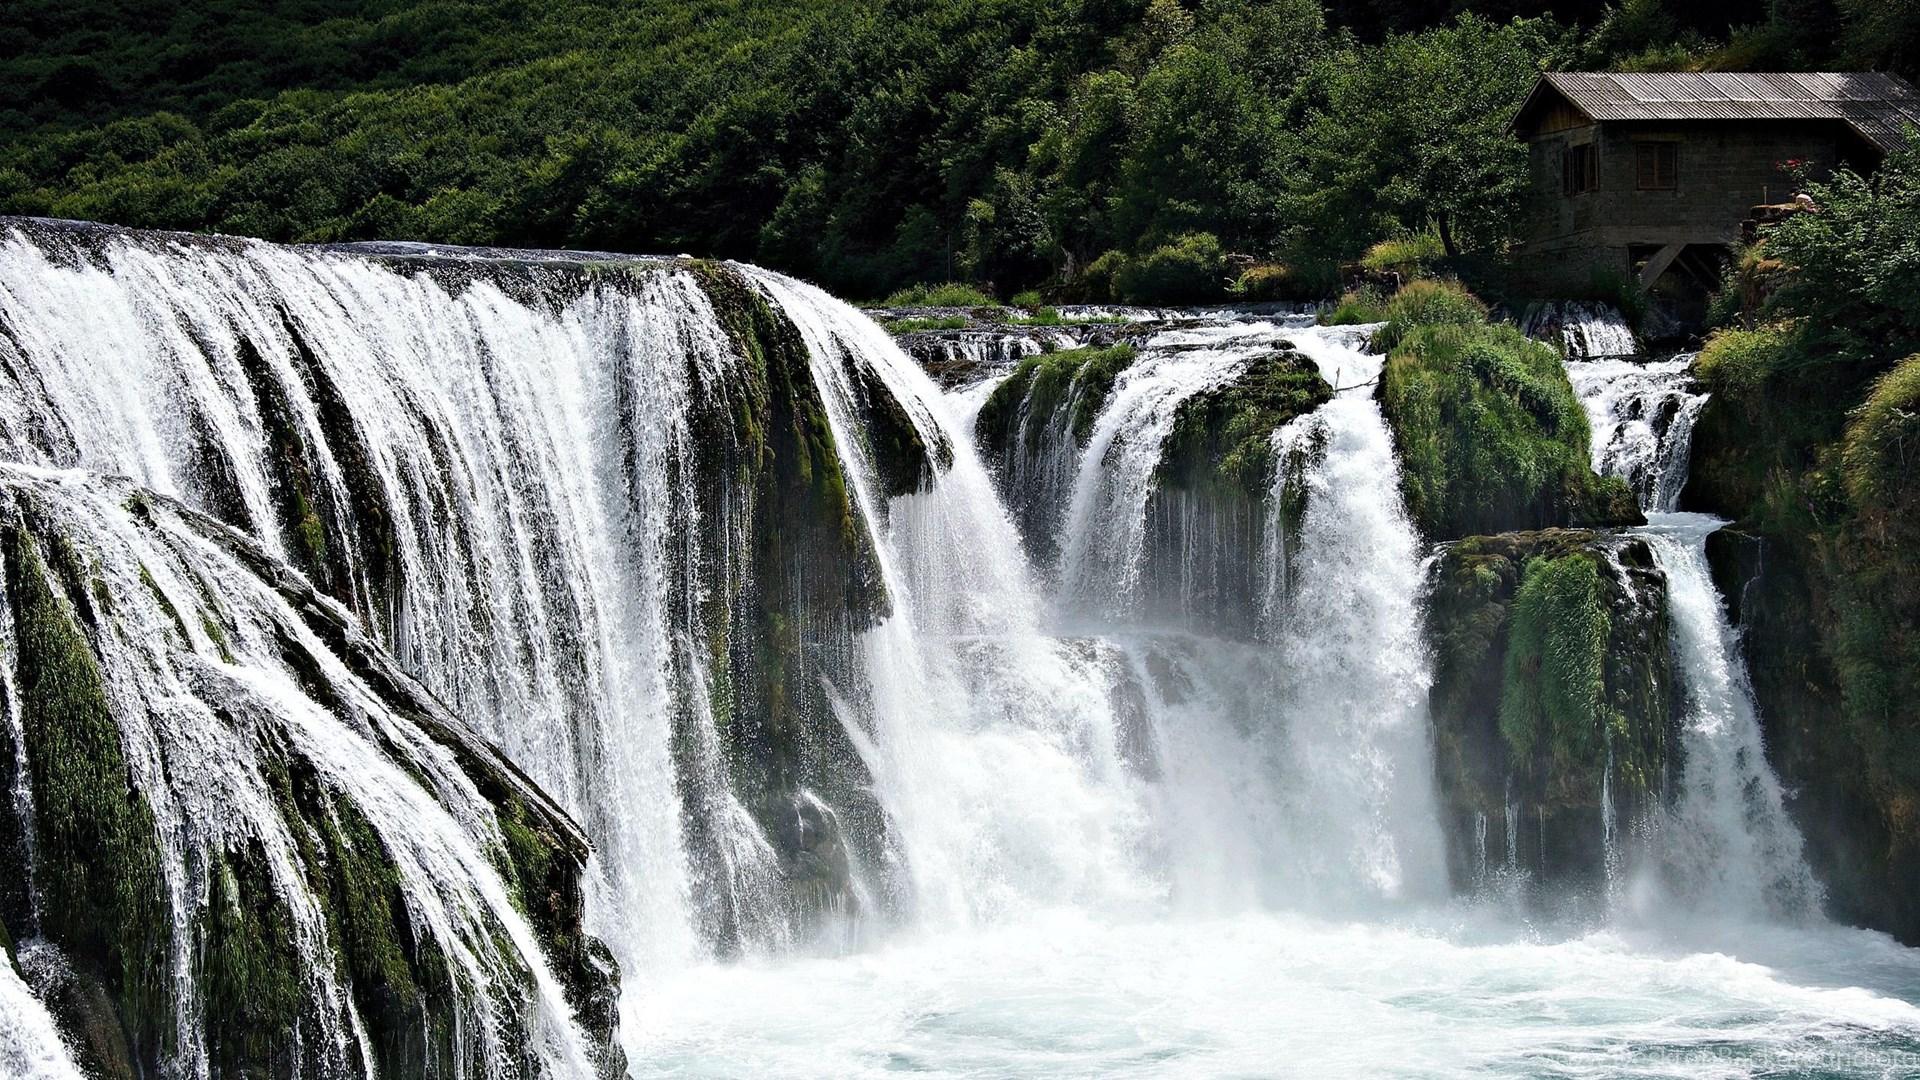 Waterfalls Wallpapers Free The Green Waterfall HD